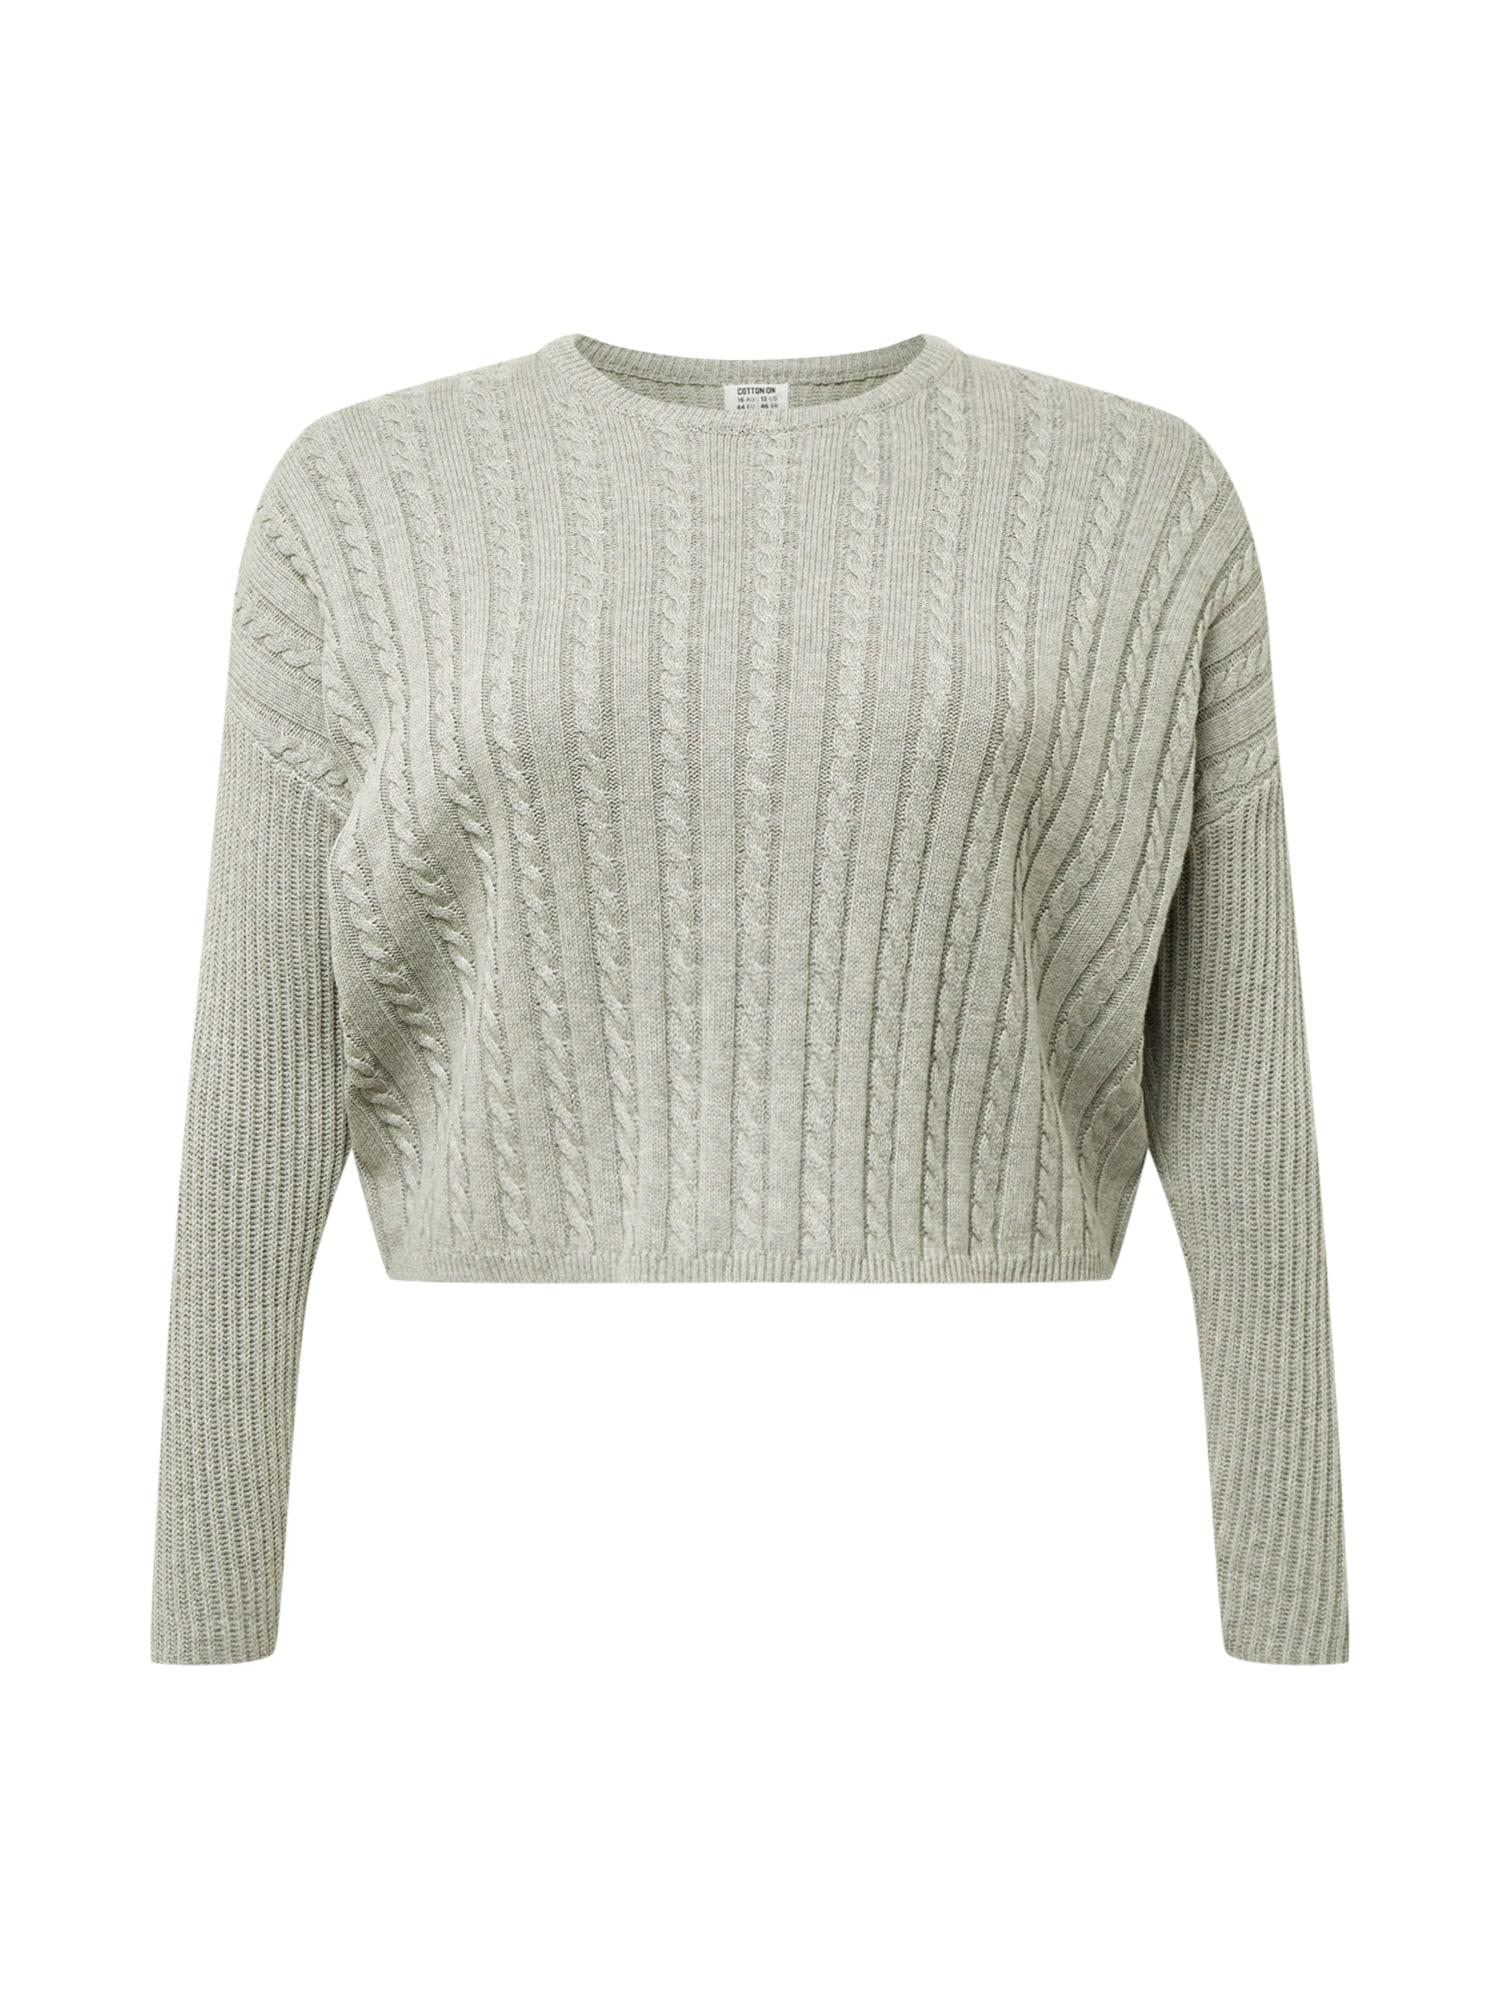 Cotton On Curve Megztinis 'Riley' sidabro pilka